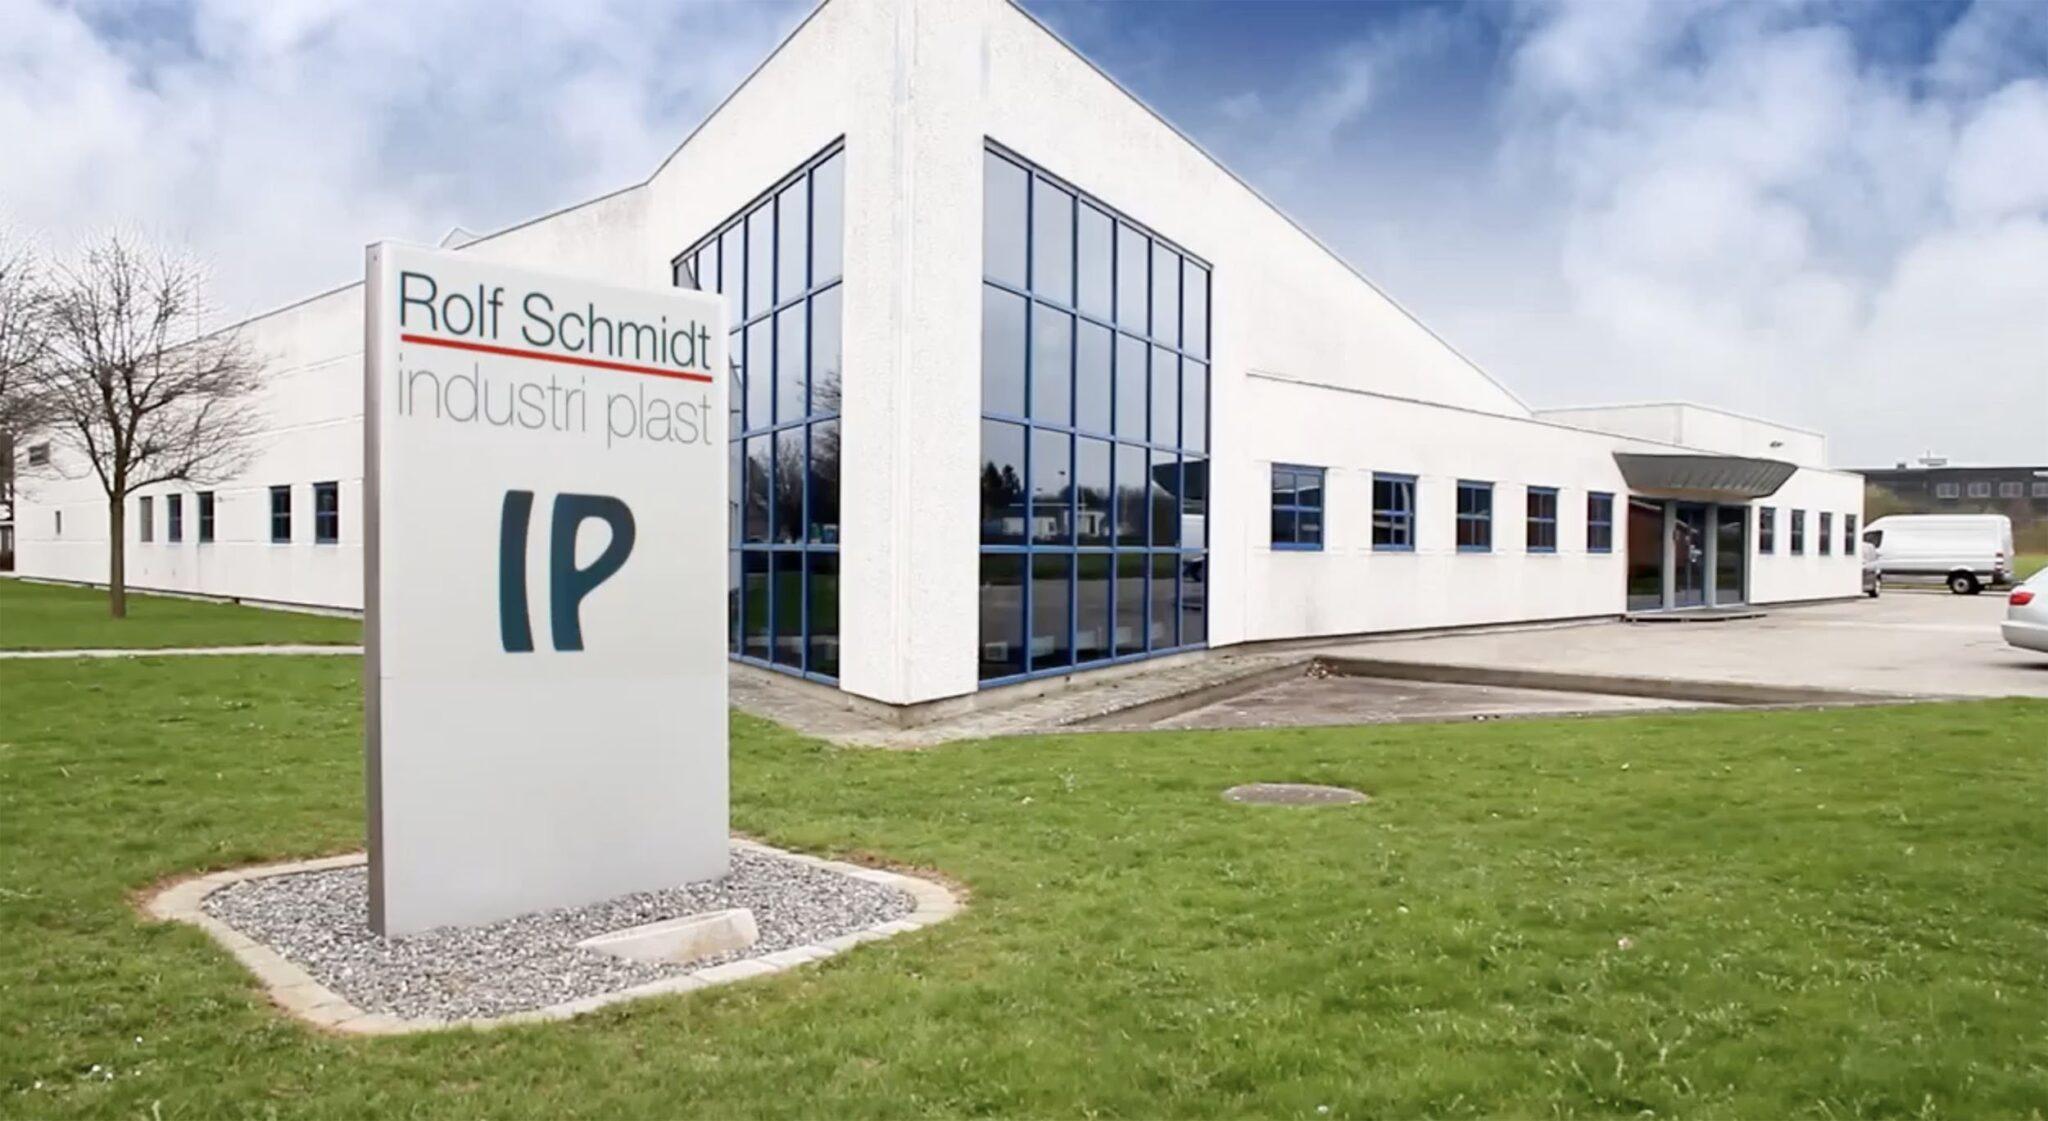 RSIP - Rolf Schmidt industri plast